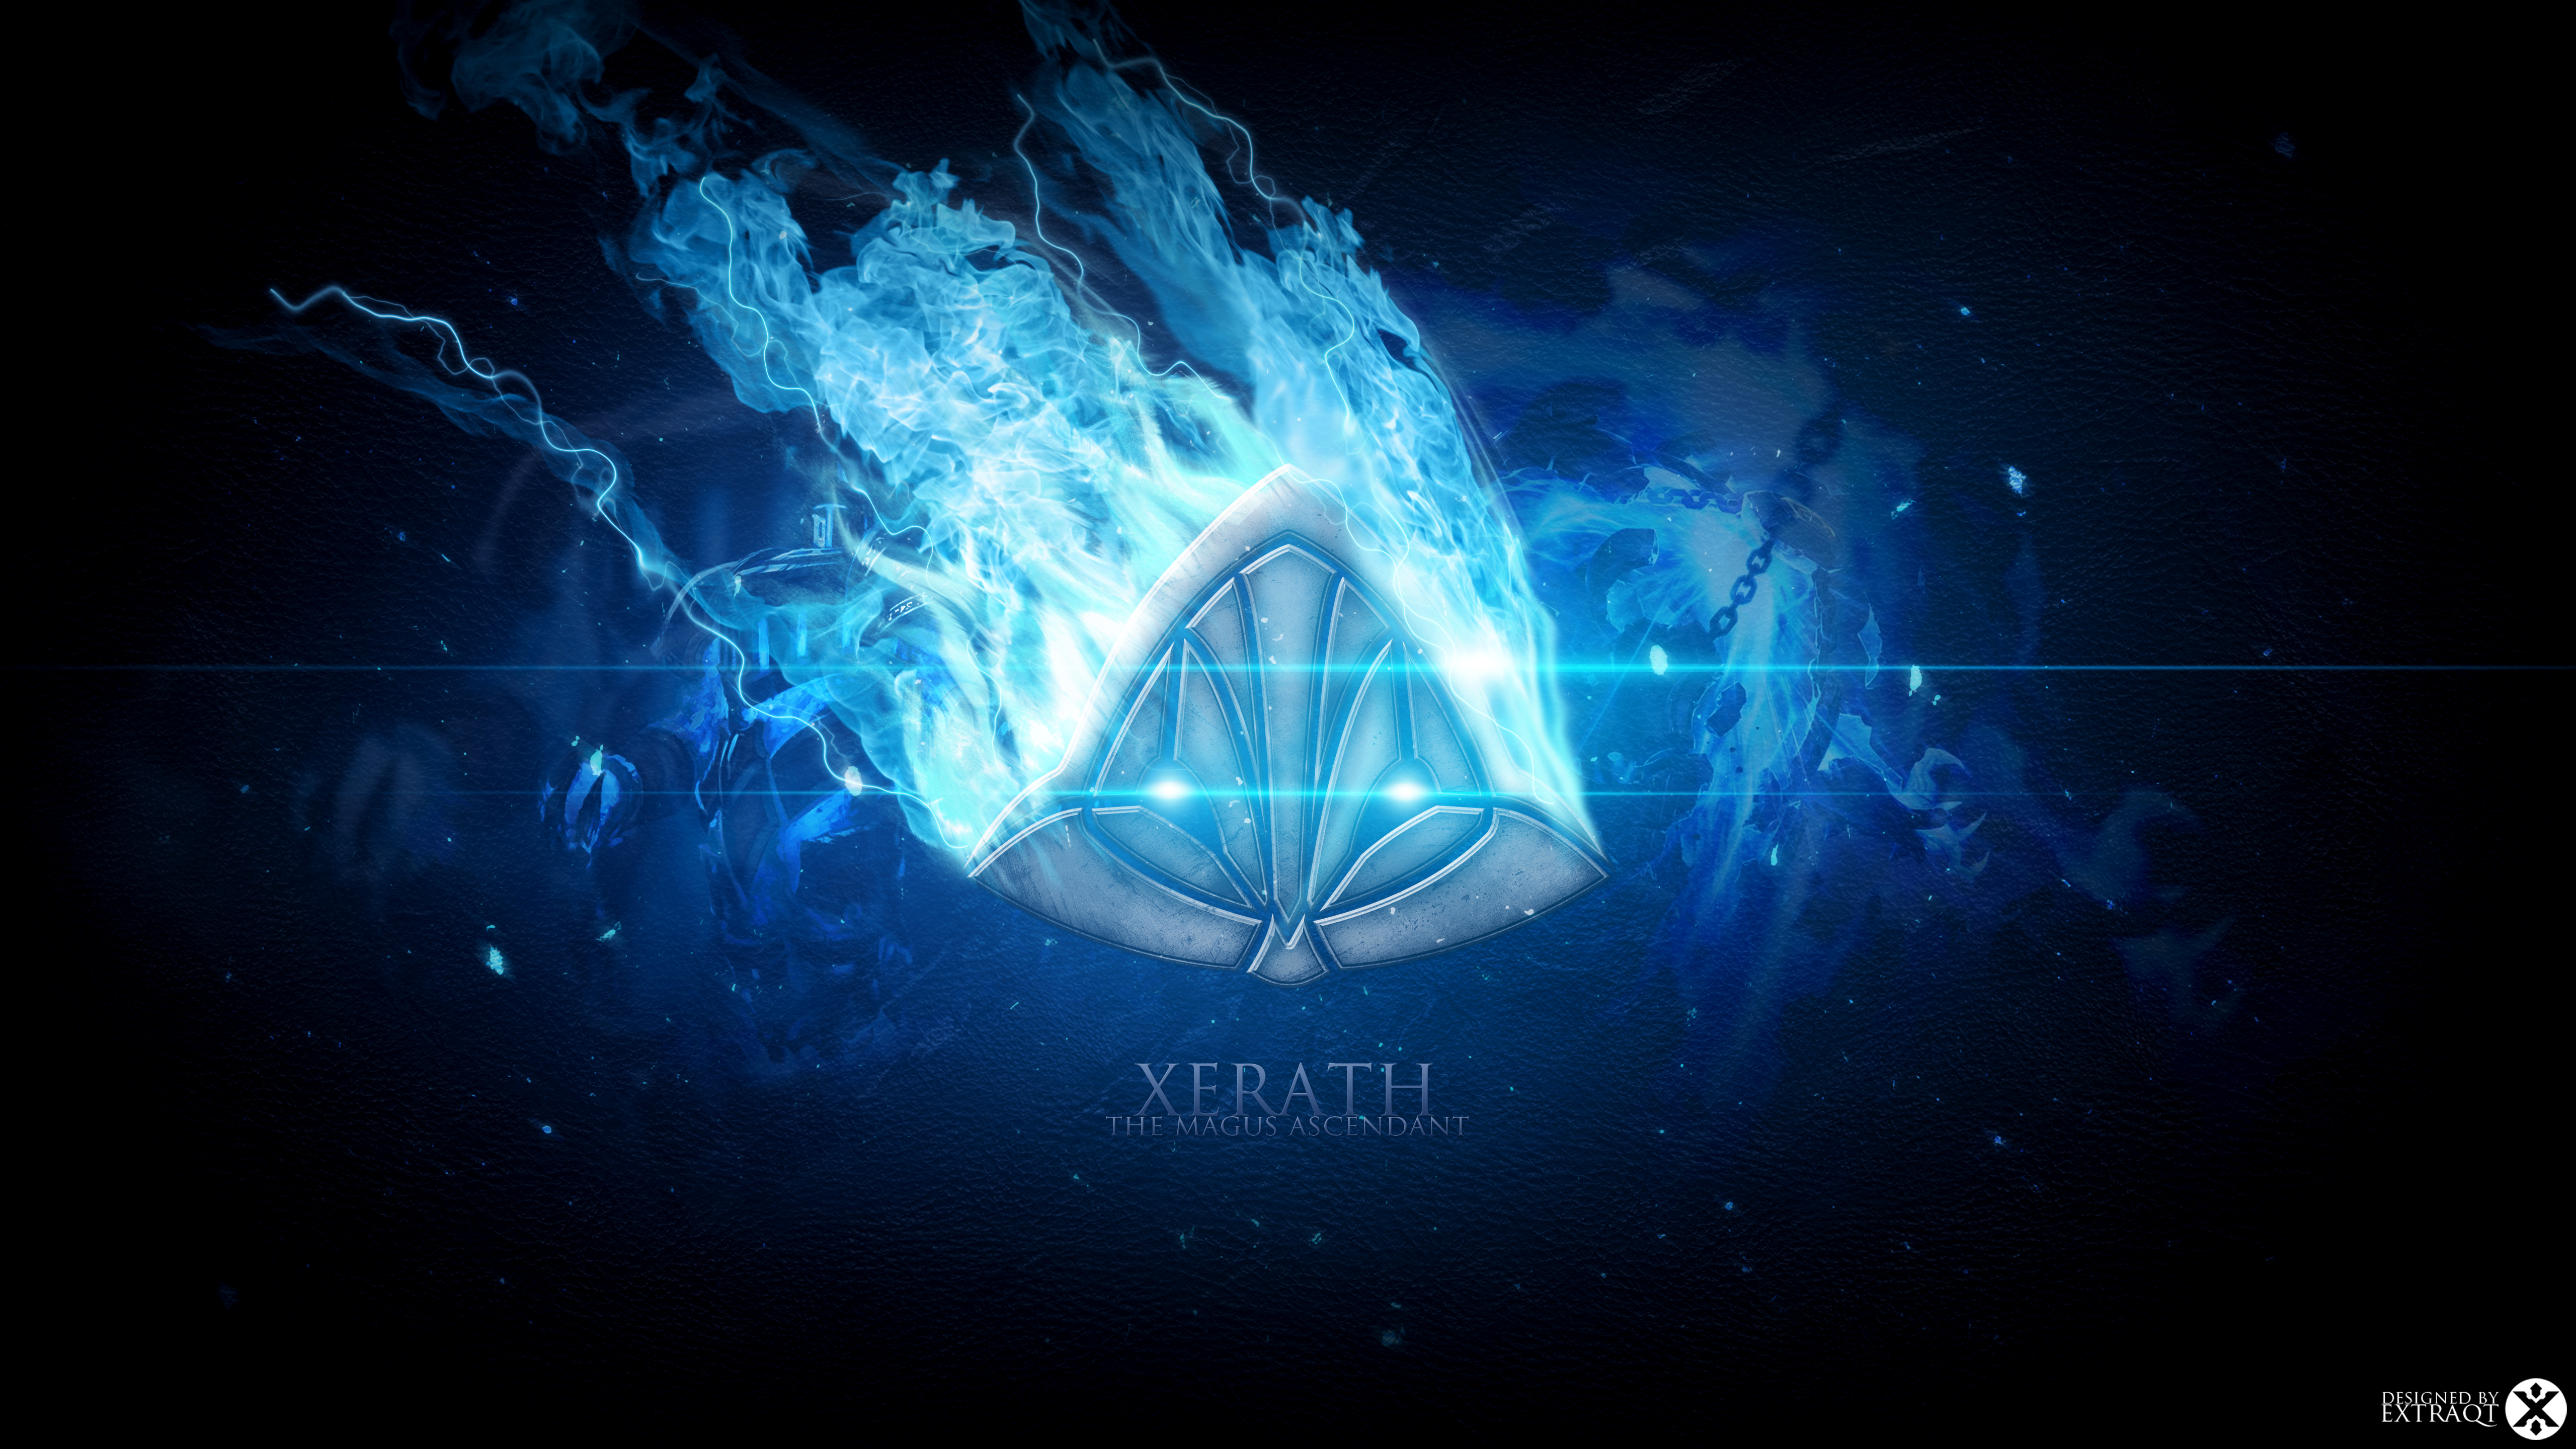 xerath_wallpaper_by_theextraqt-d7veonl